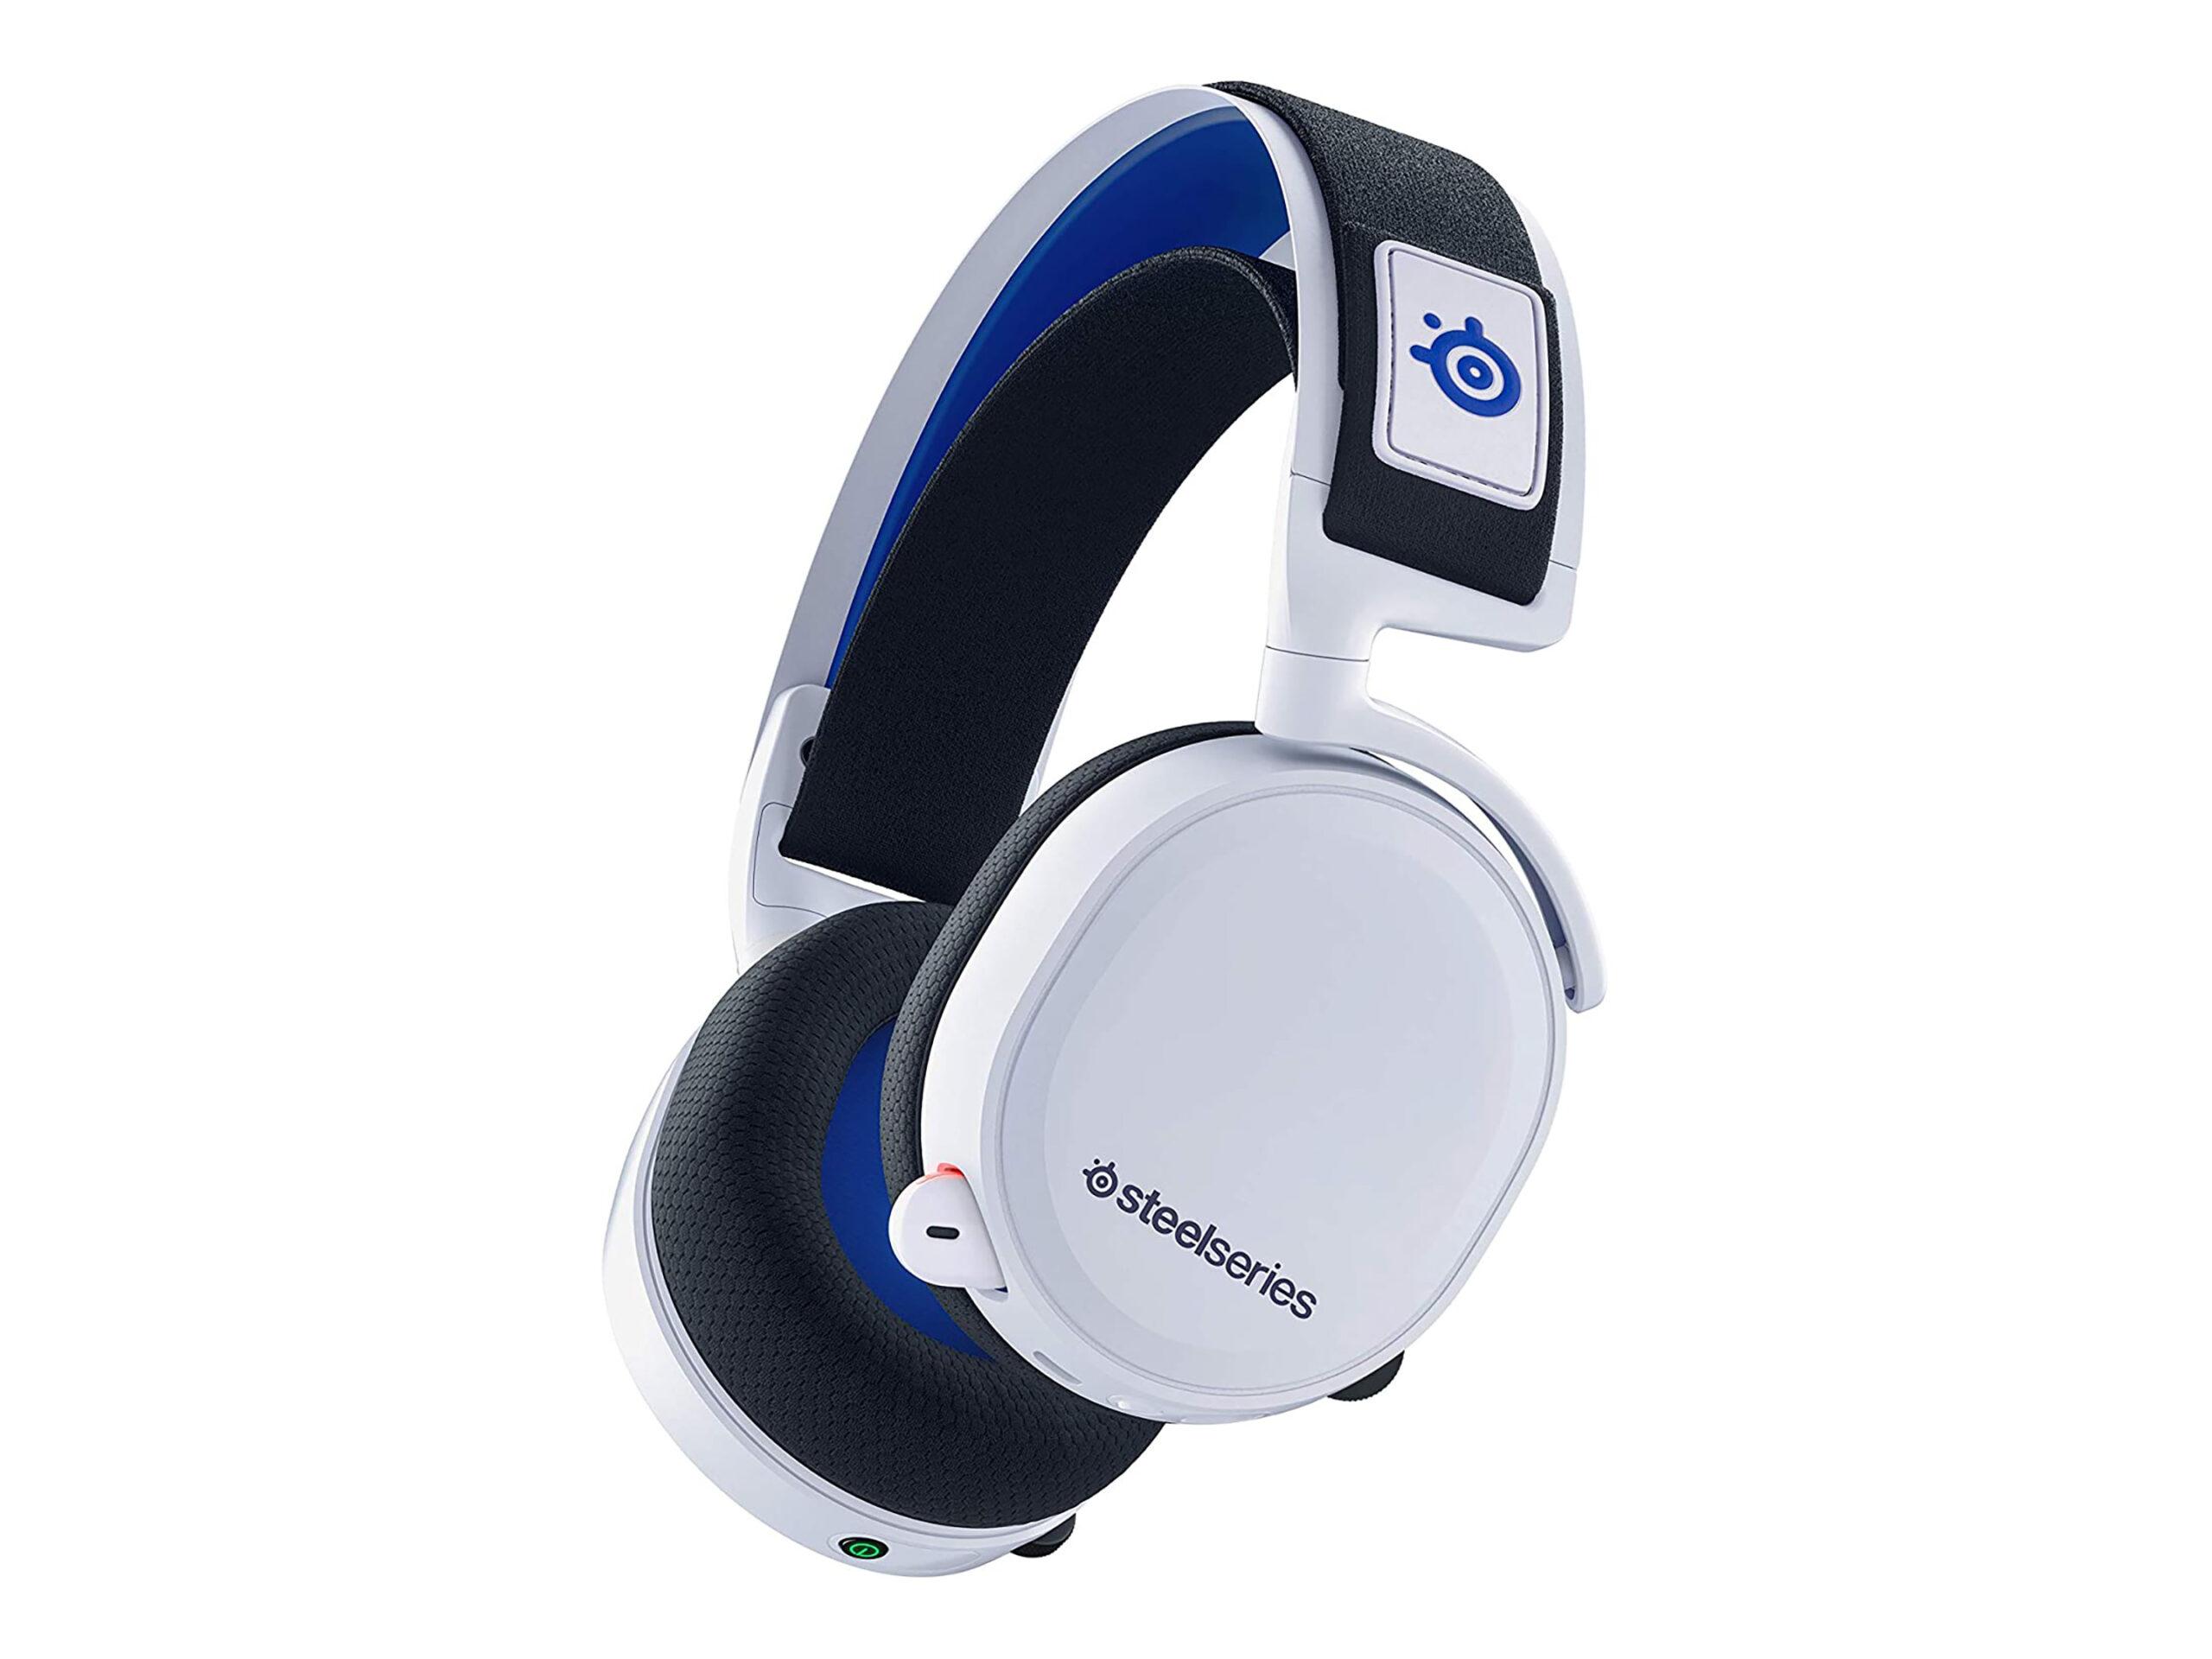 SteelSeries Arctis 7P headset